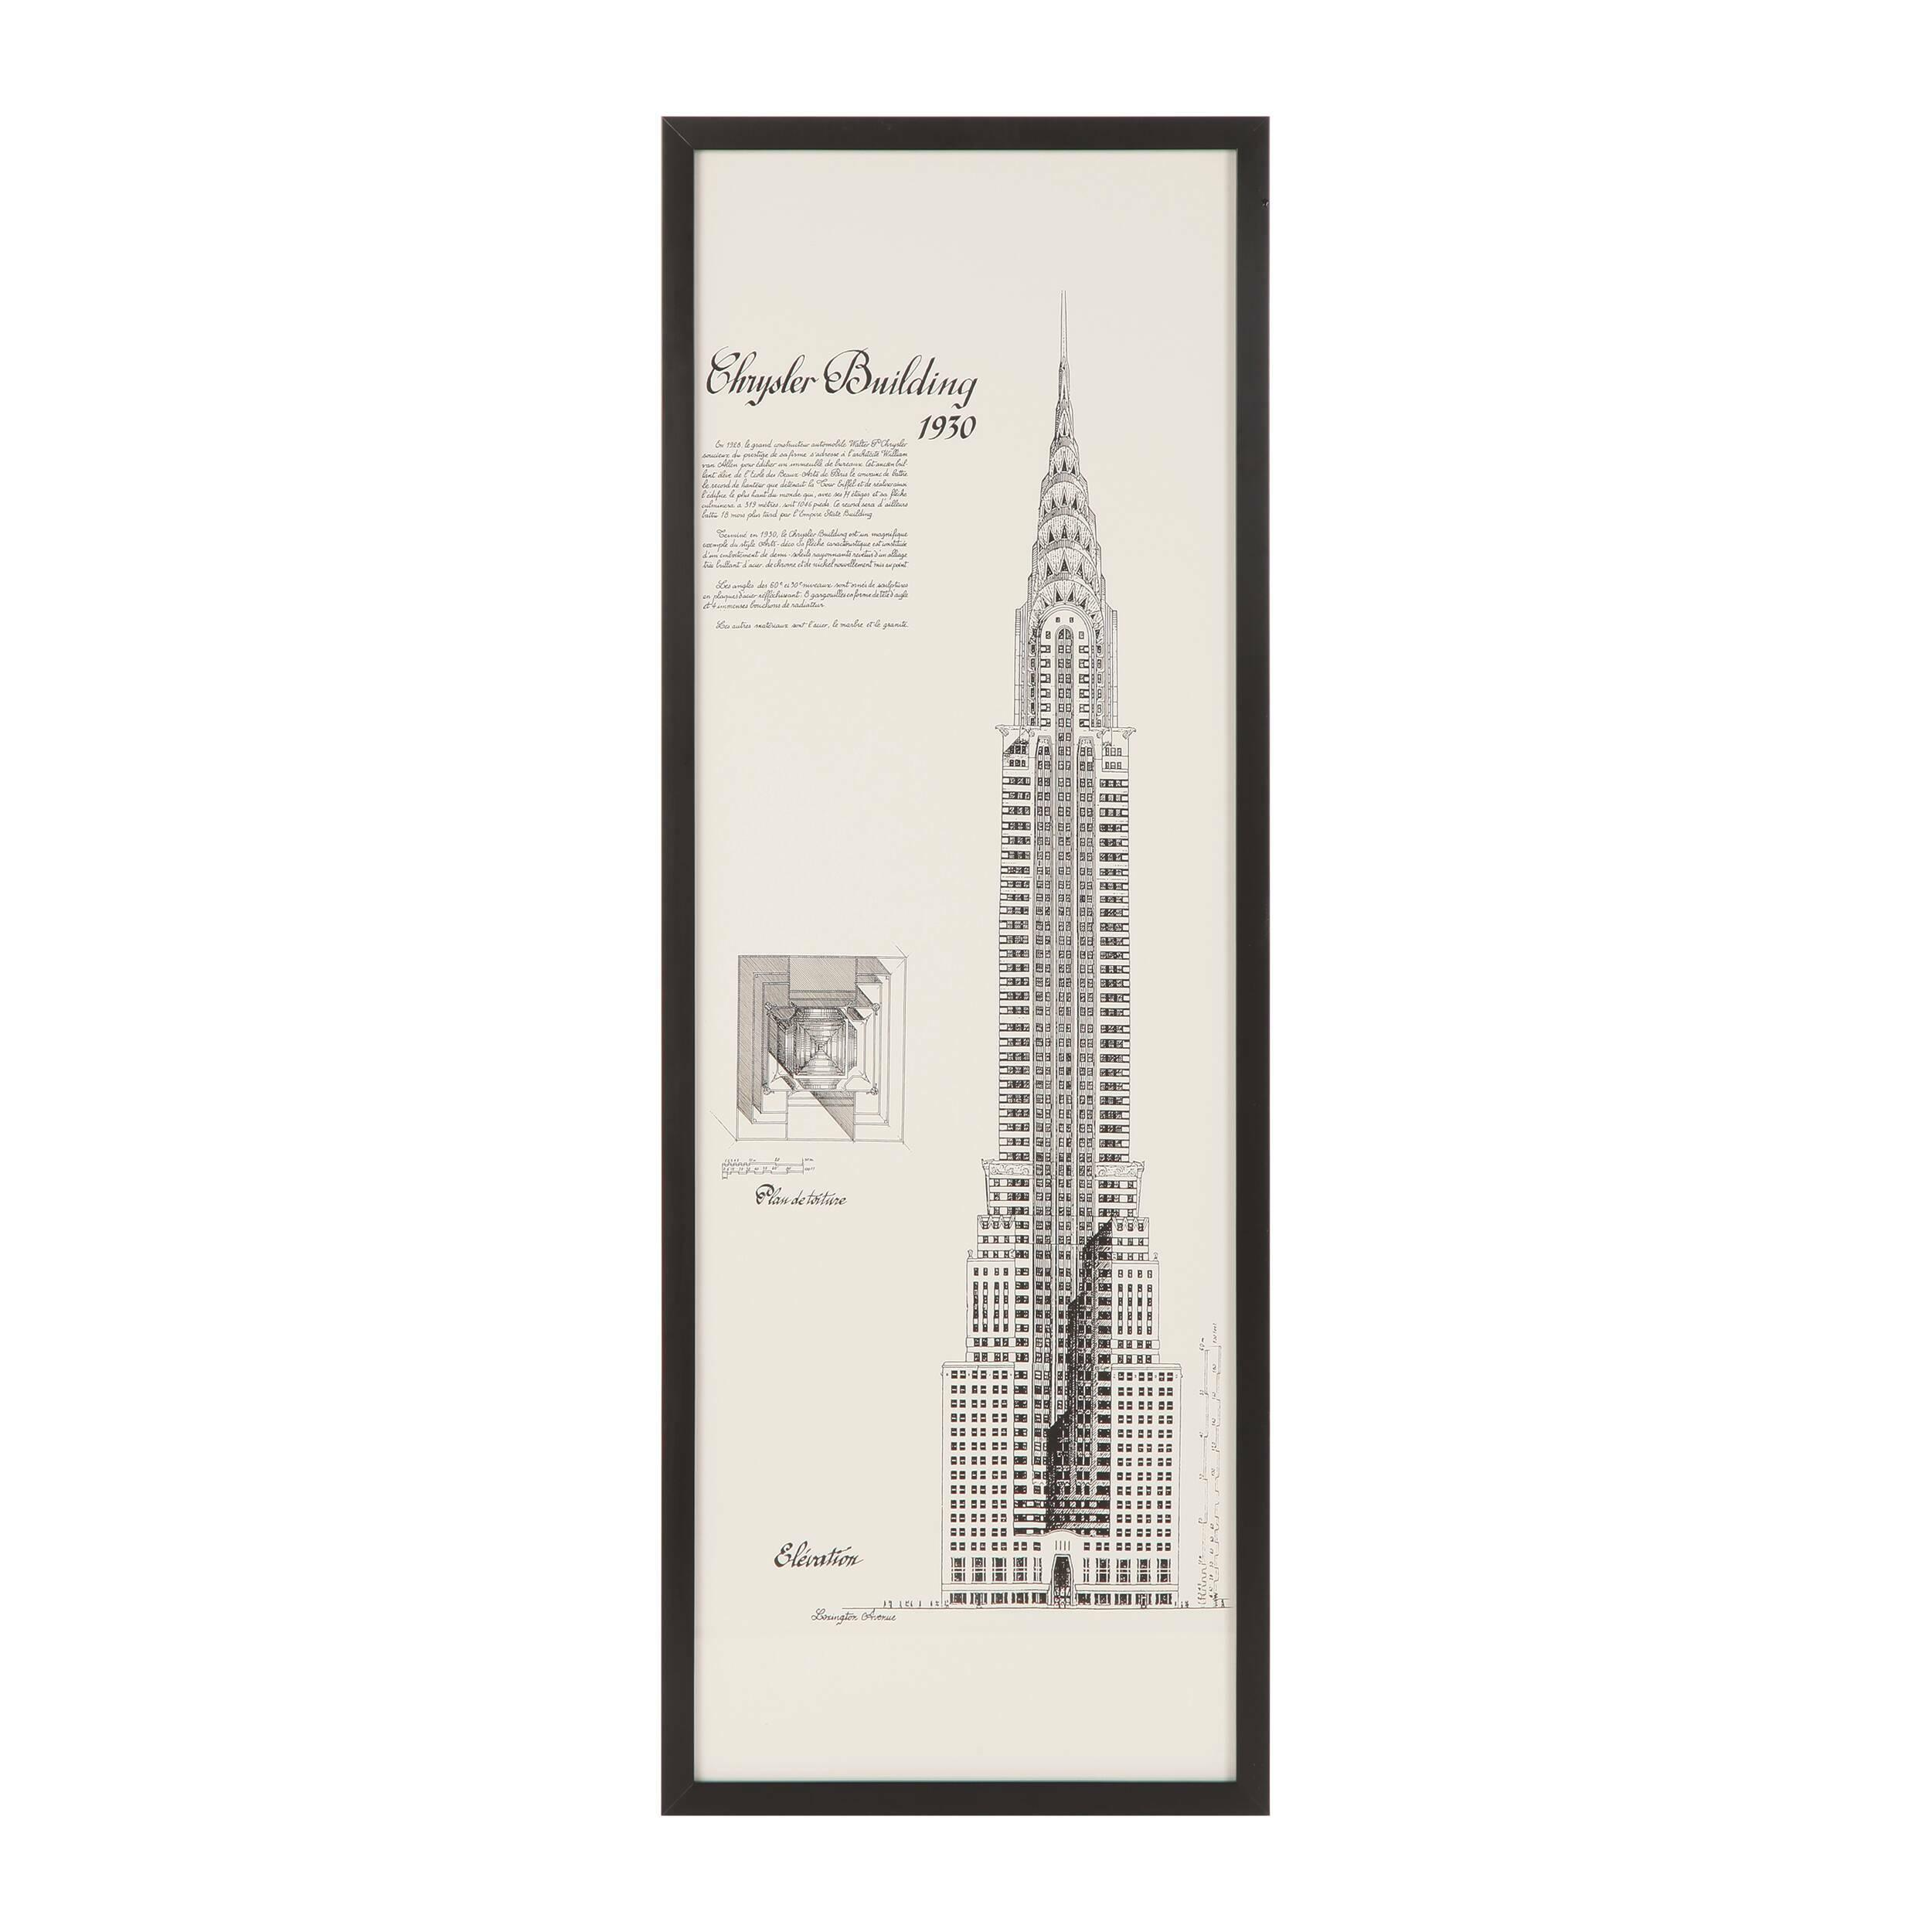 Постер Chrysler BuildingКартины<br><br><br>stock: 5<br>Ширина: 35,6<br>Цвет: Черный<br>Длина: 100,6